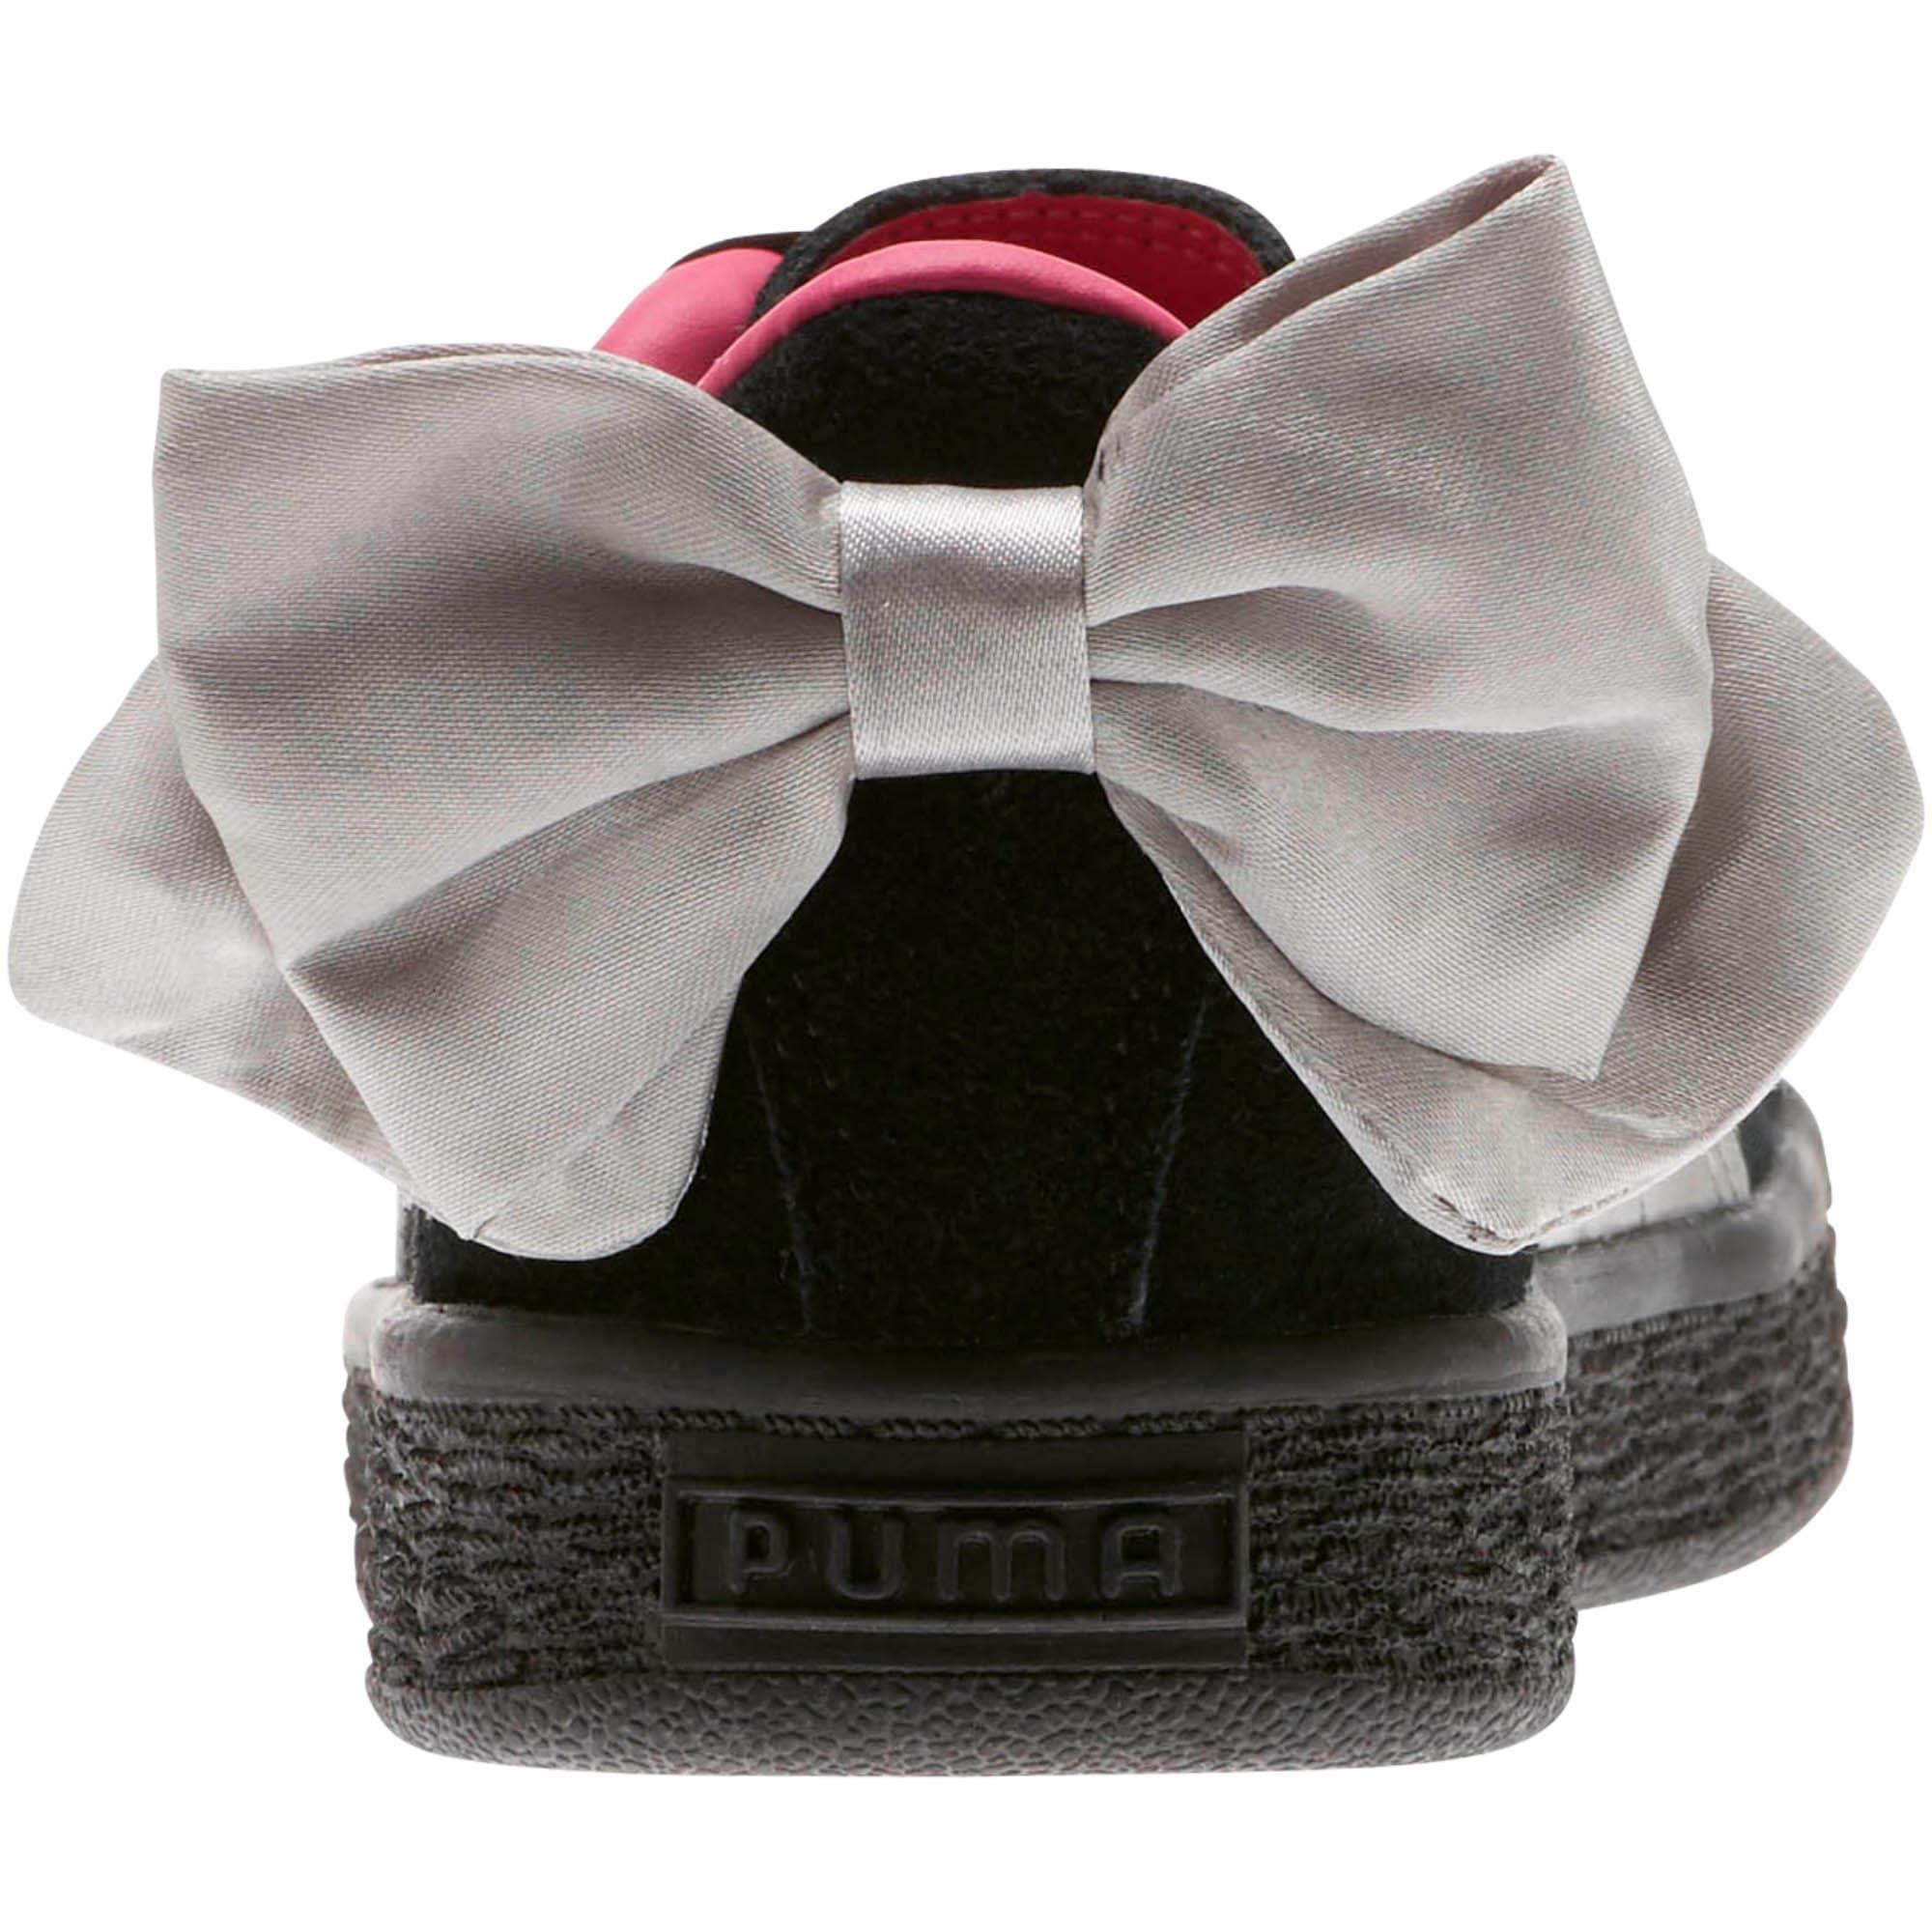 Thumbnail 4 of Suede Bow AC Little Kids' Shoes, Puma Black-Fuchsia Purple, medium